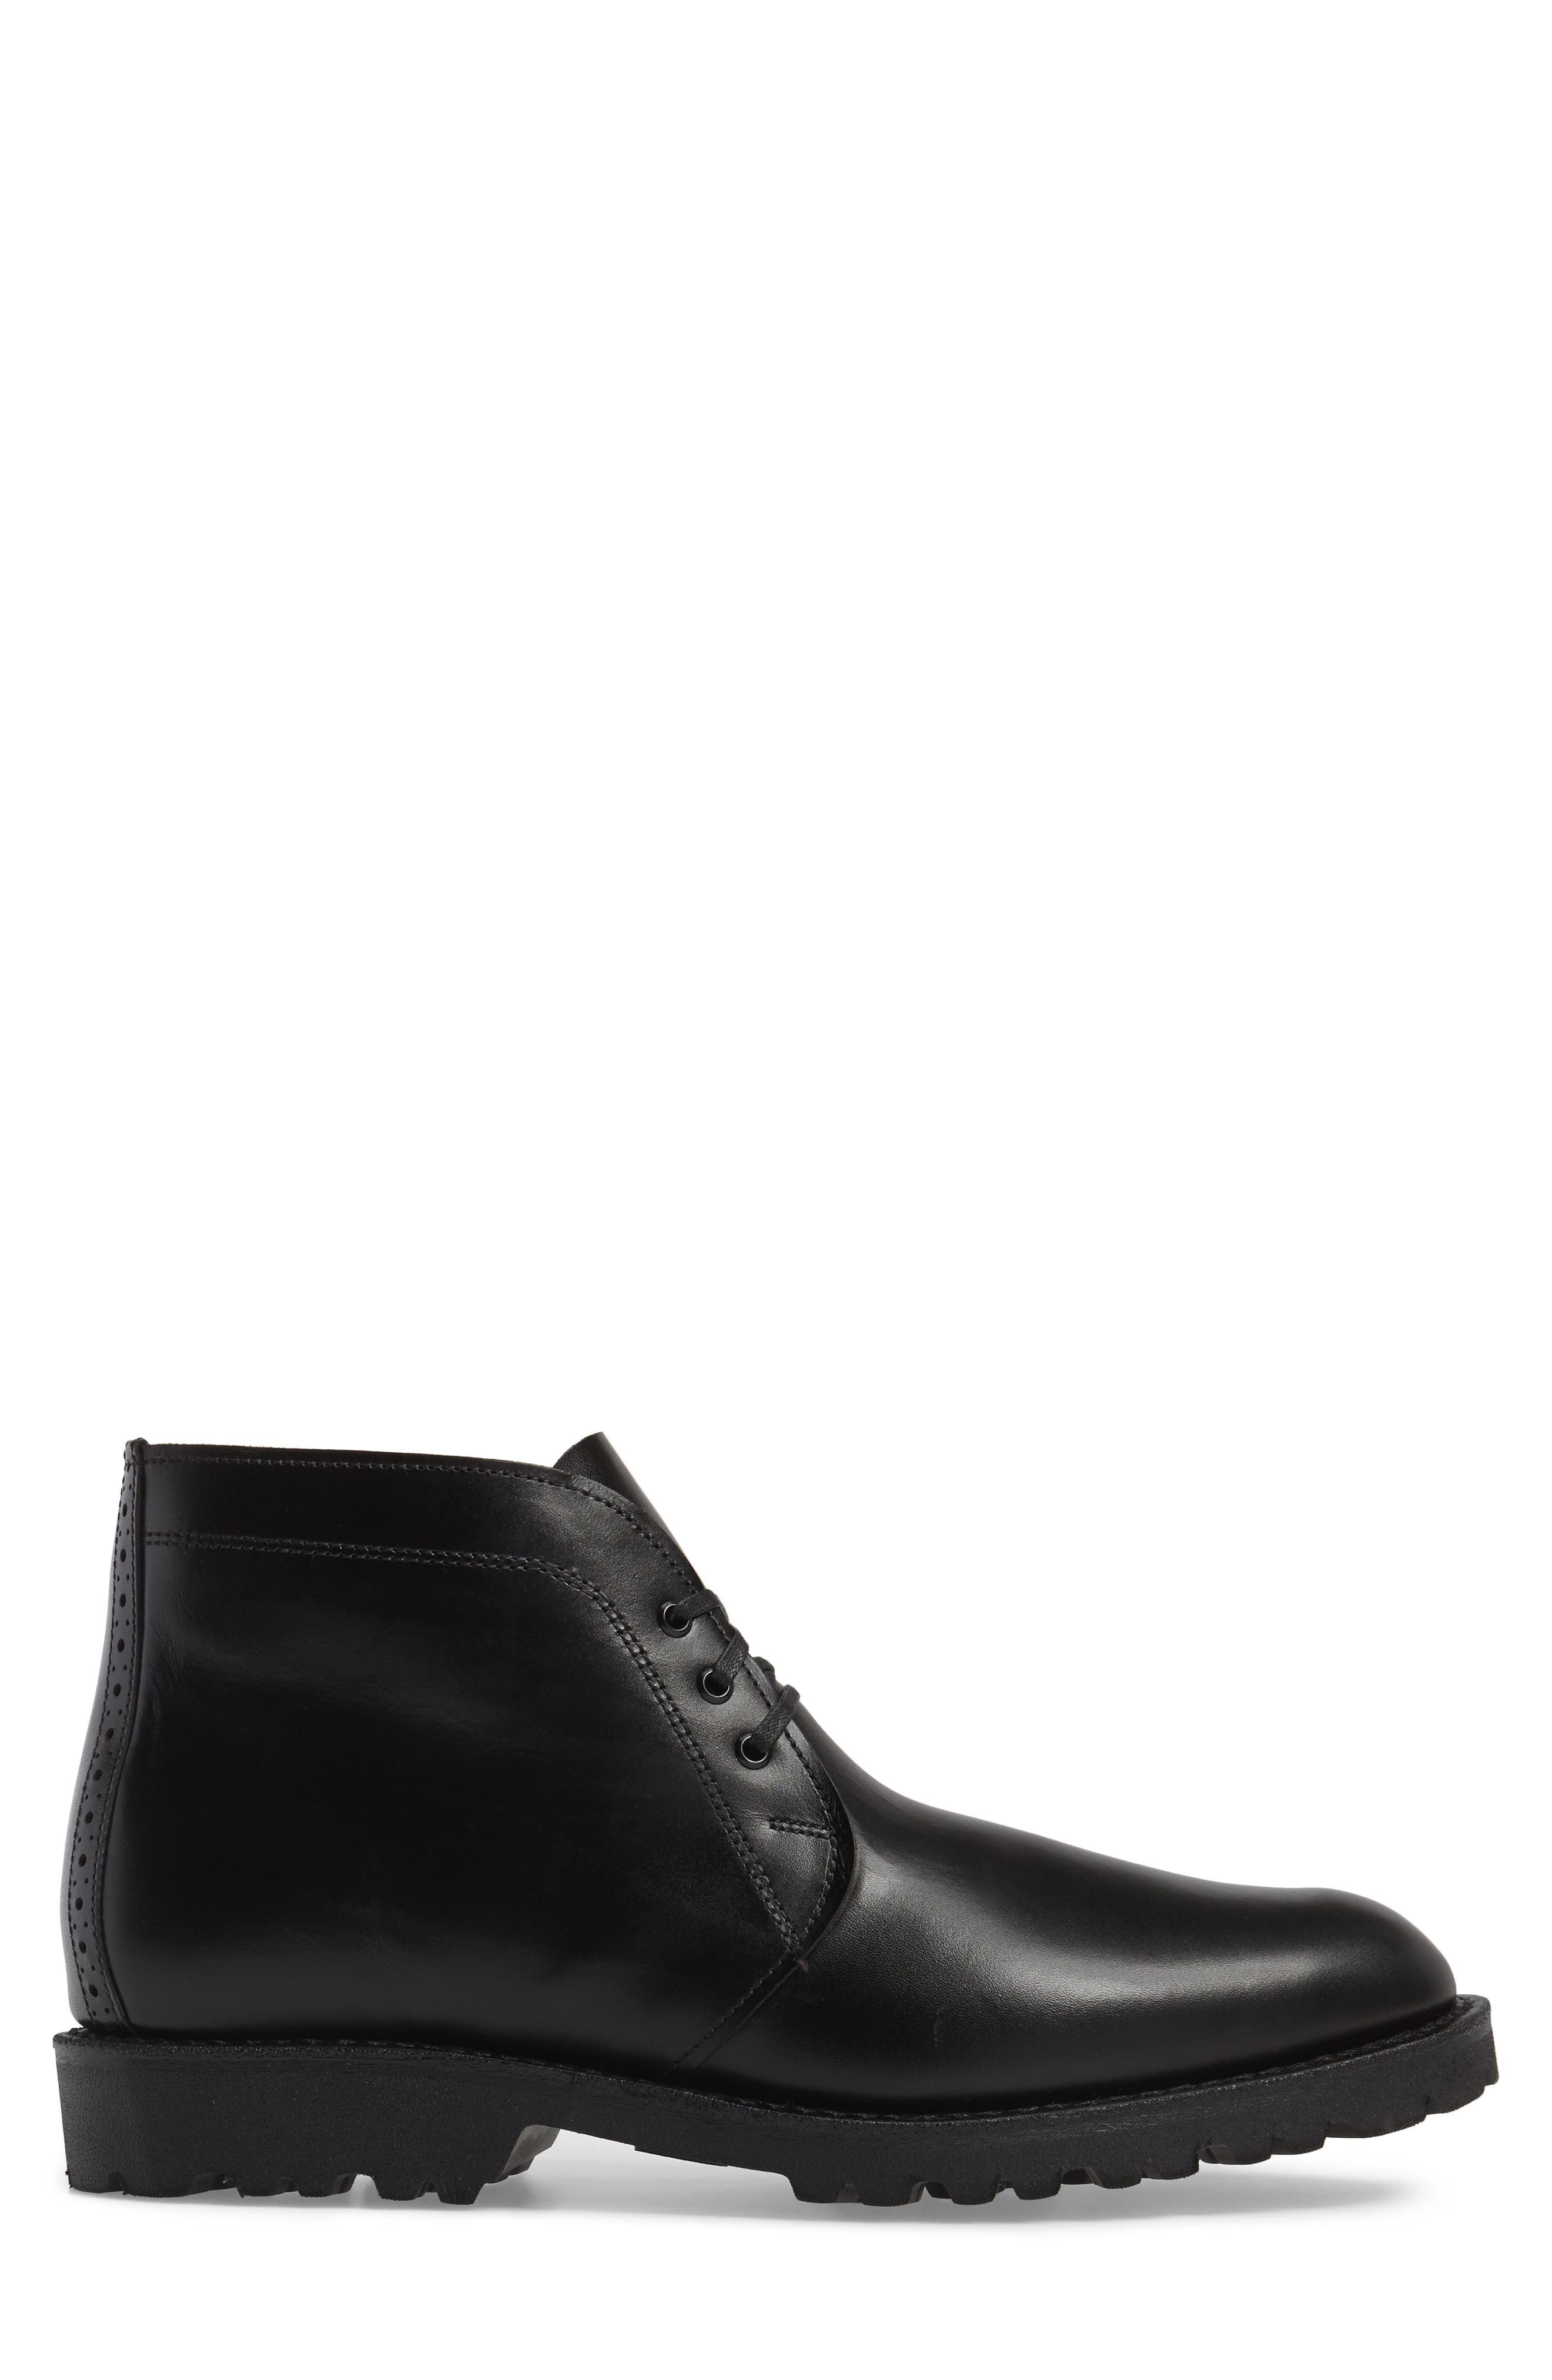 Tate Chukka Boot,                             Alternate thumbnail 3, color,                             Black Leather